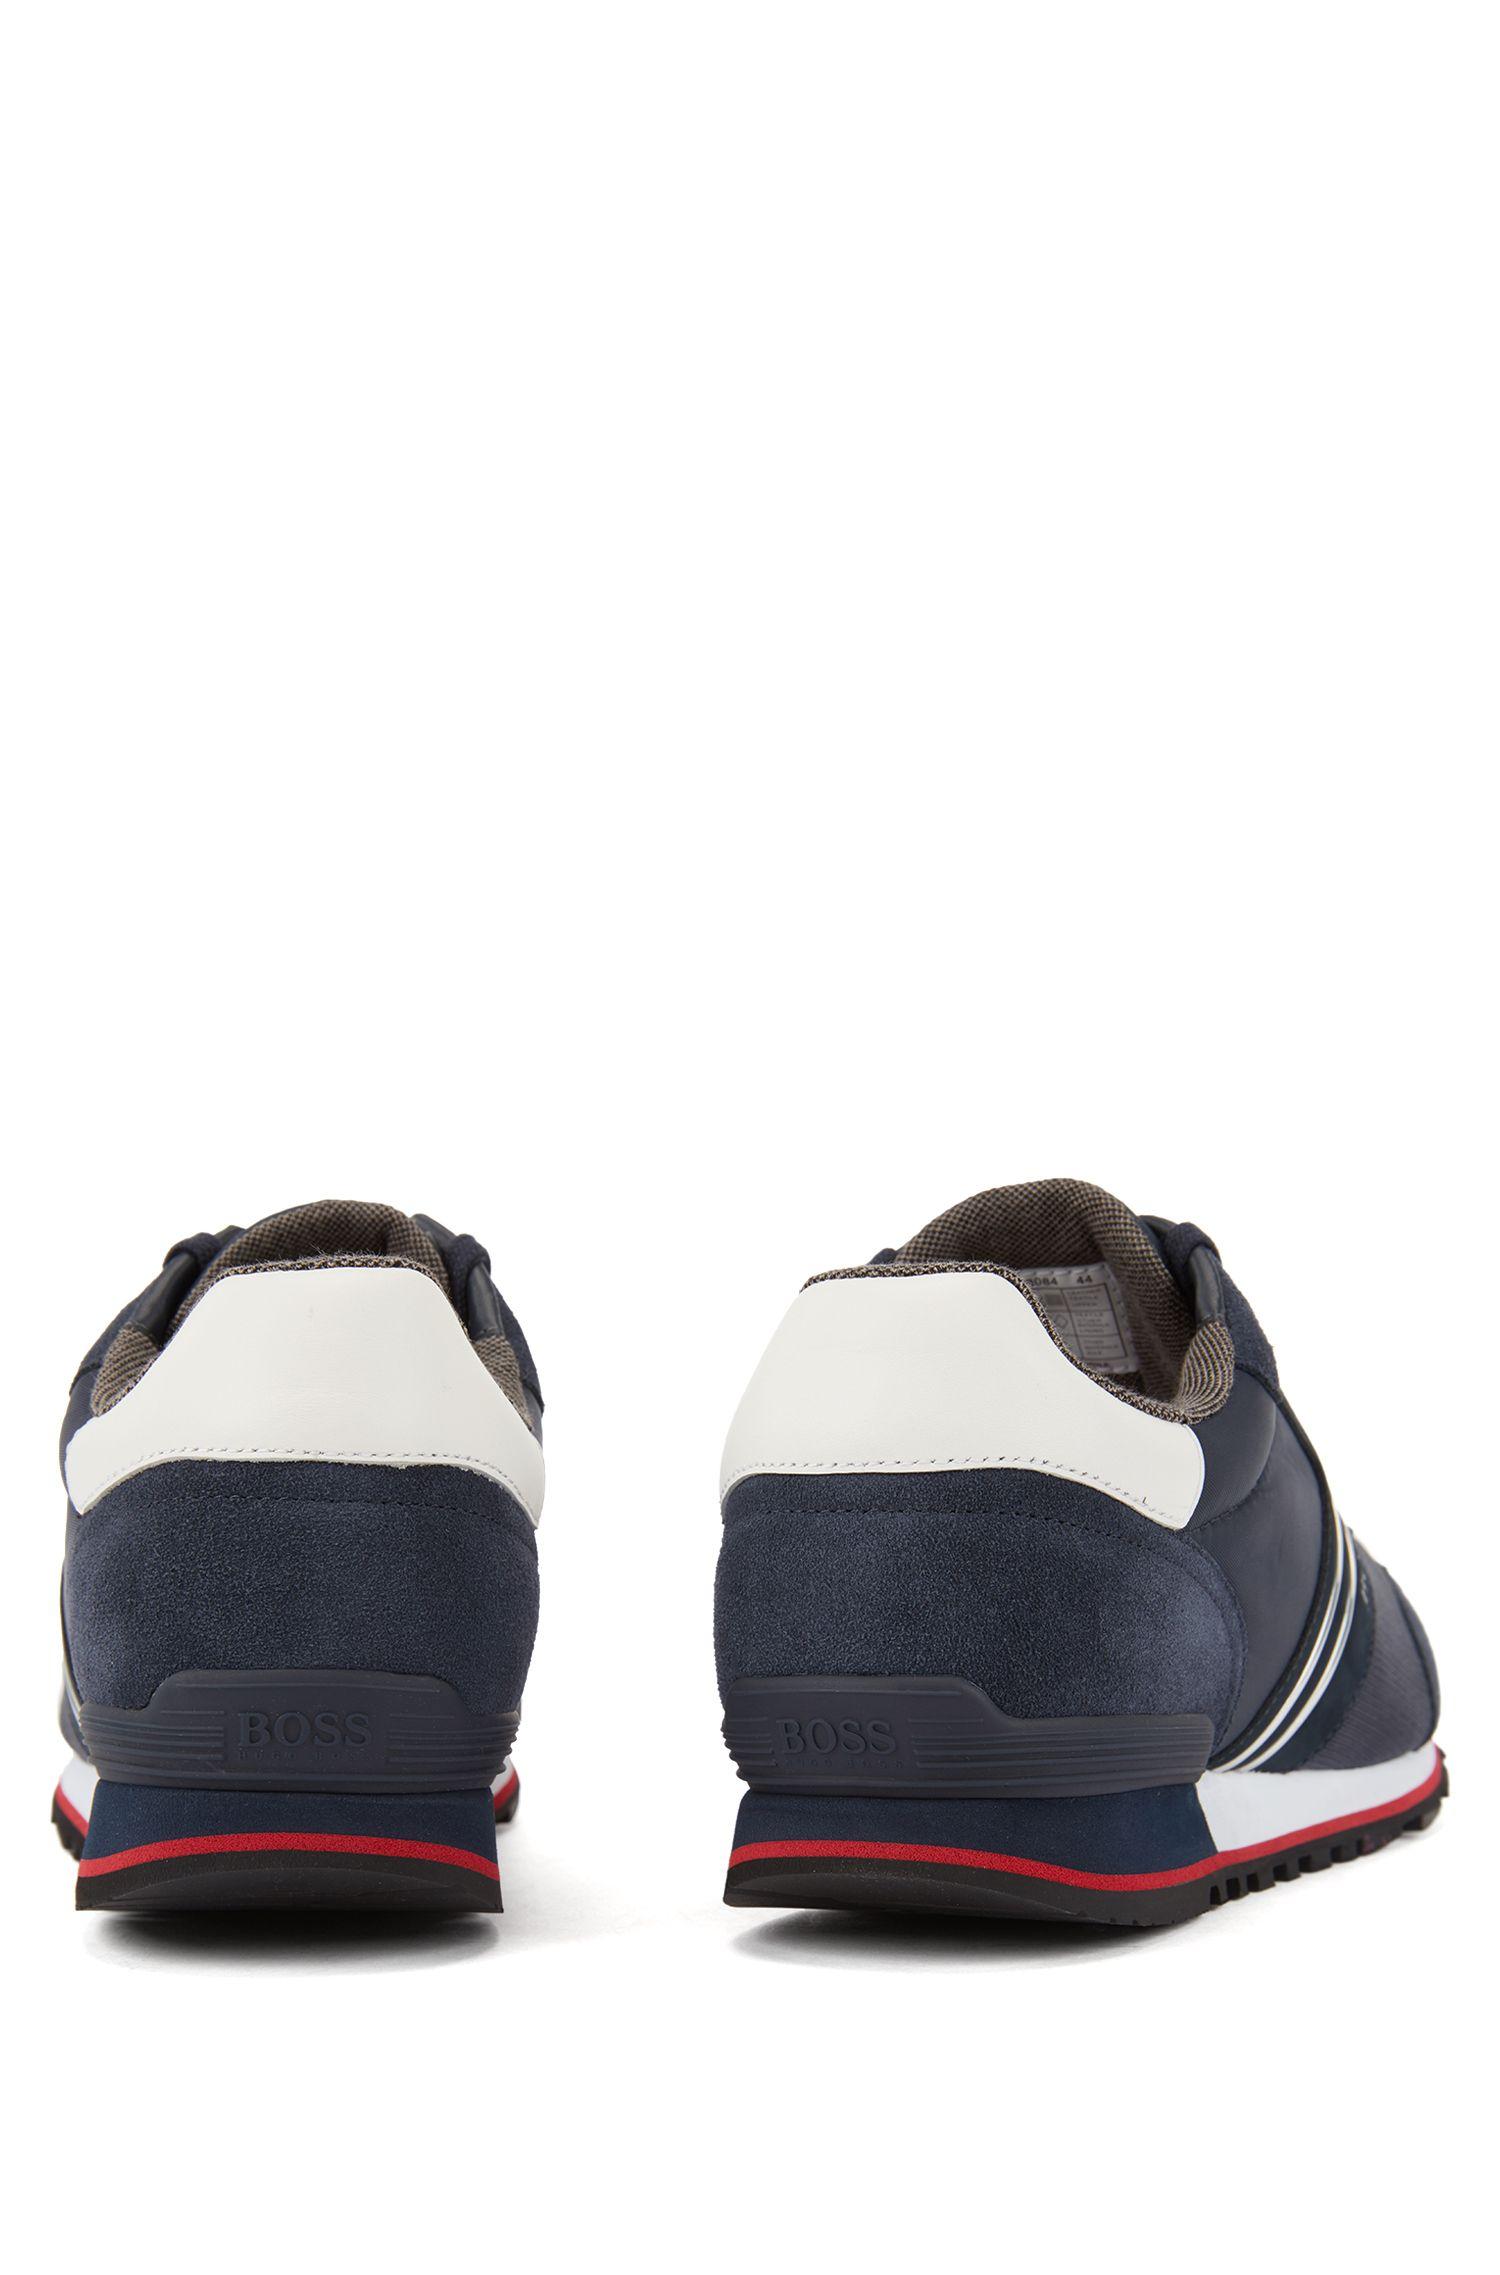 Hybride sneakers in hardloopstijl met voering van bamboe-koolstofmateriaal, Donkerblauw